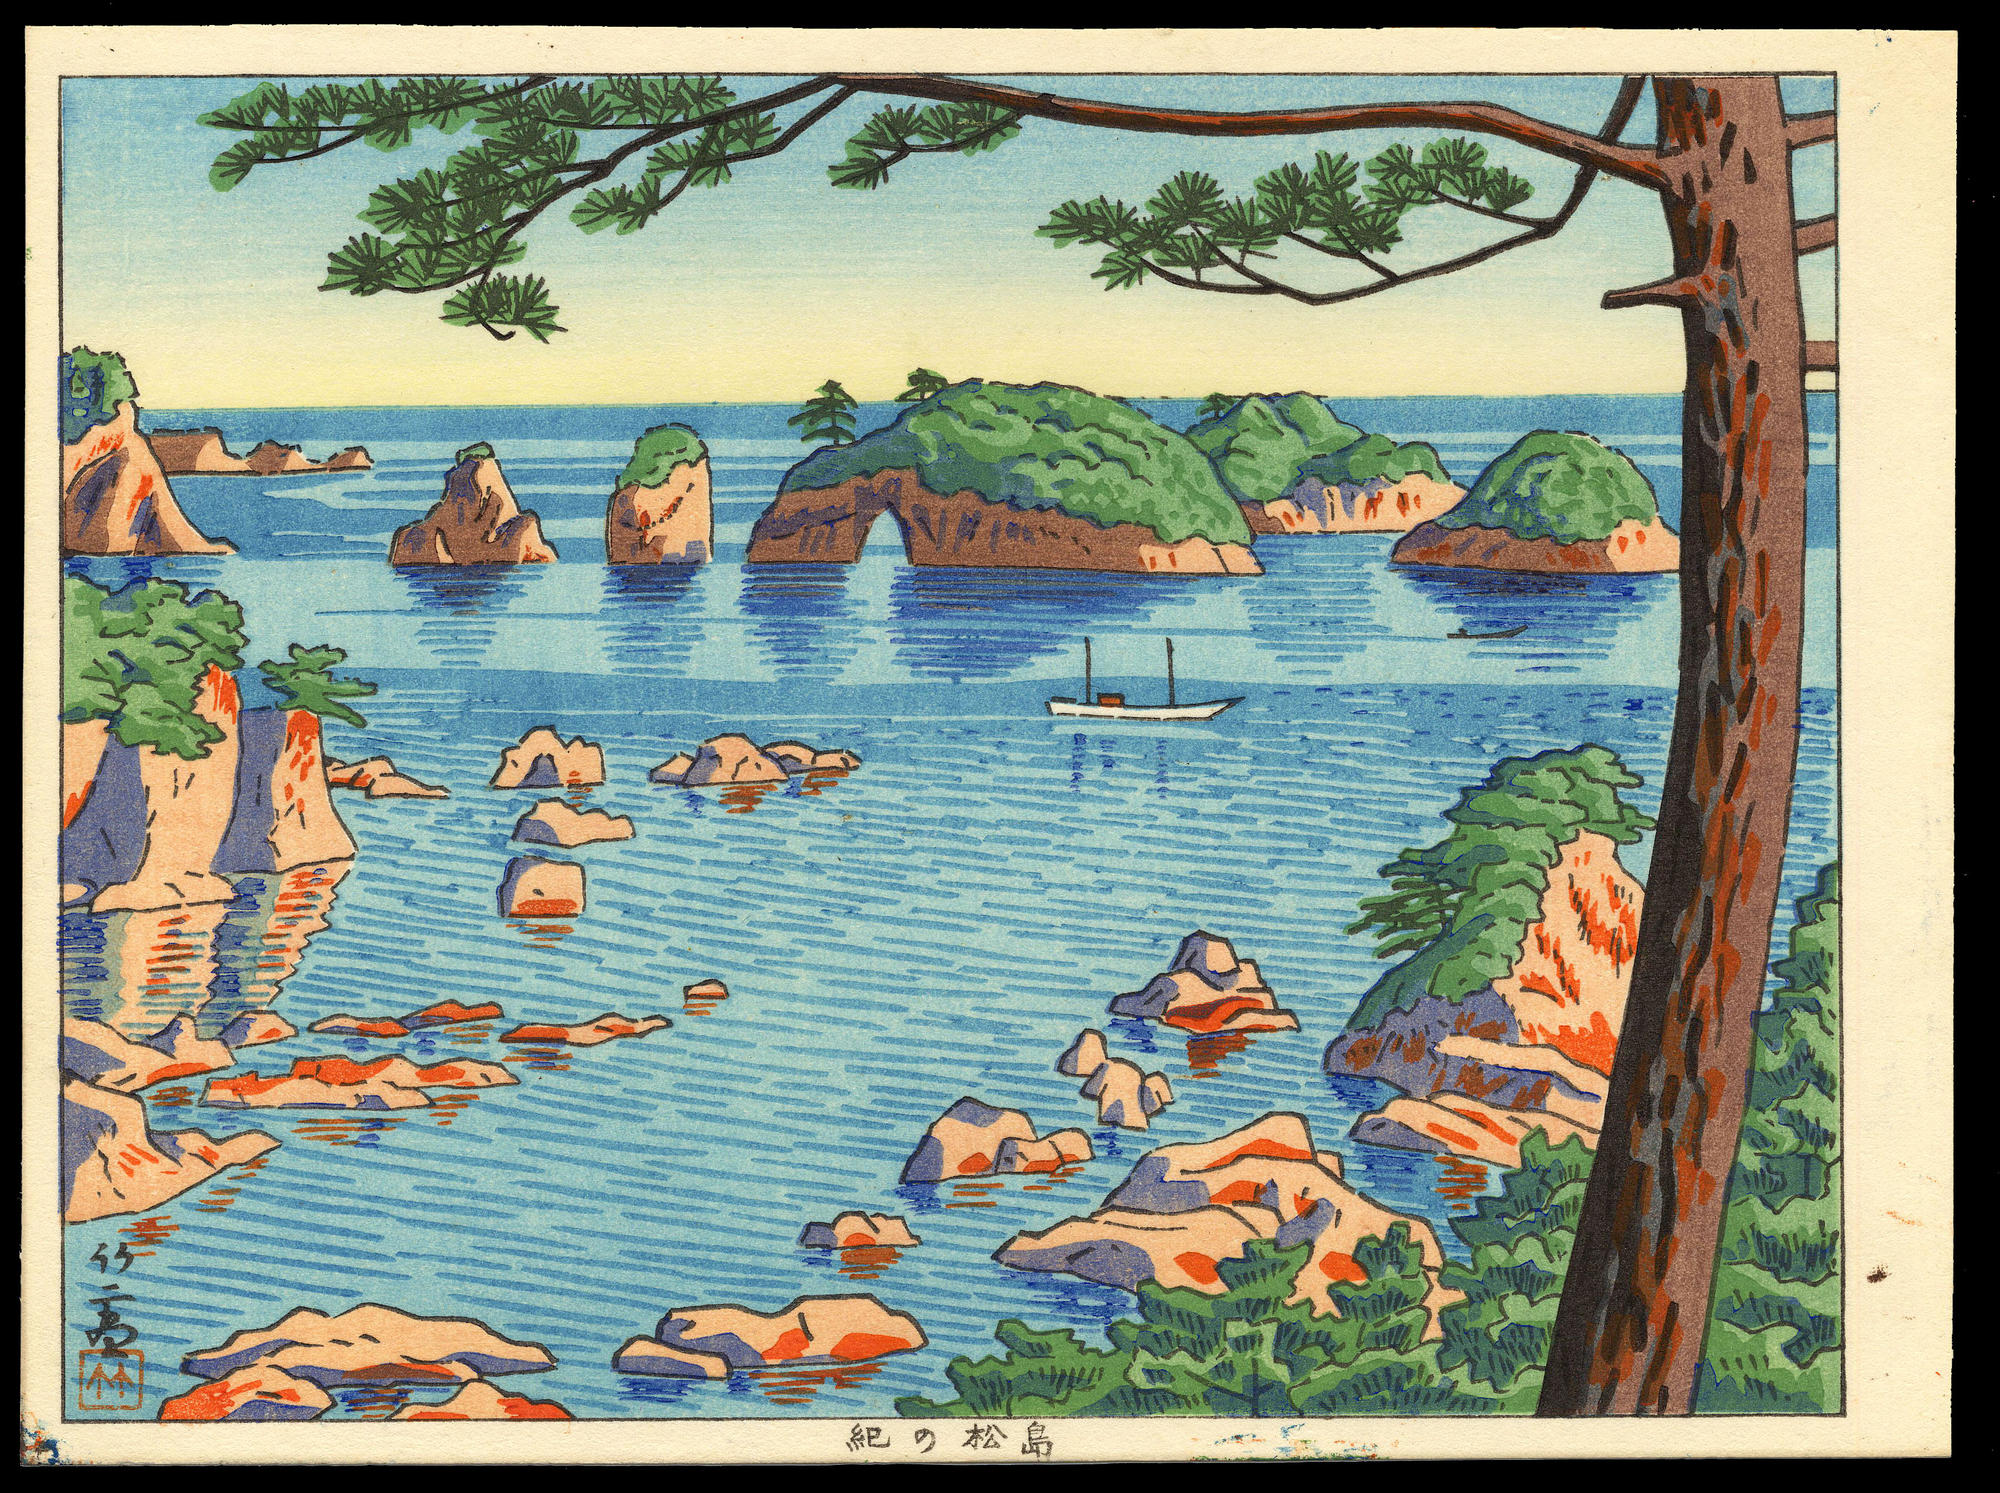 Ilustración japonesa takeji asano. Estampa ukiyo-e playa japon